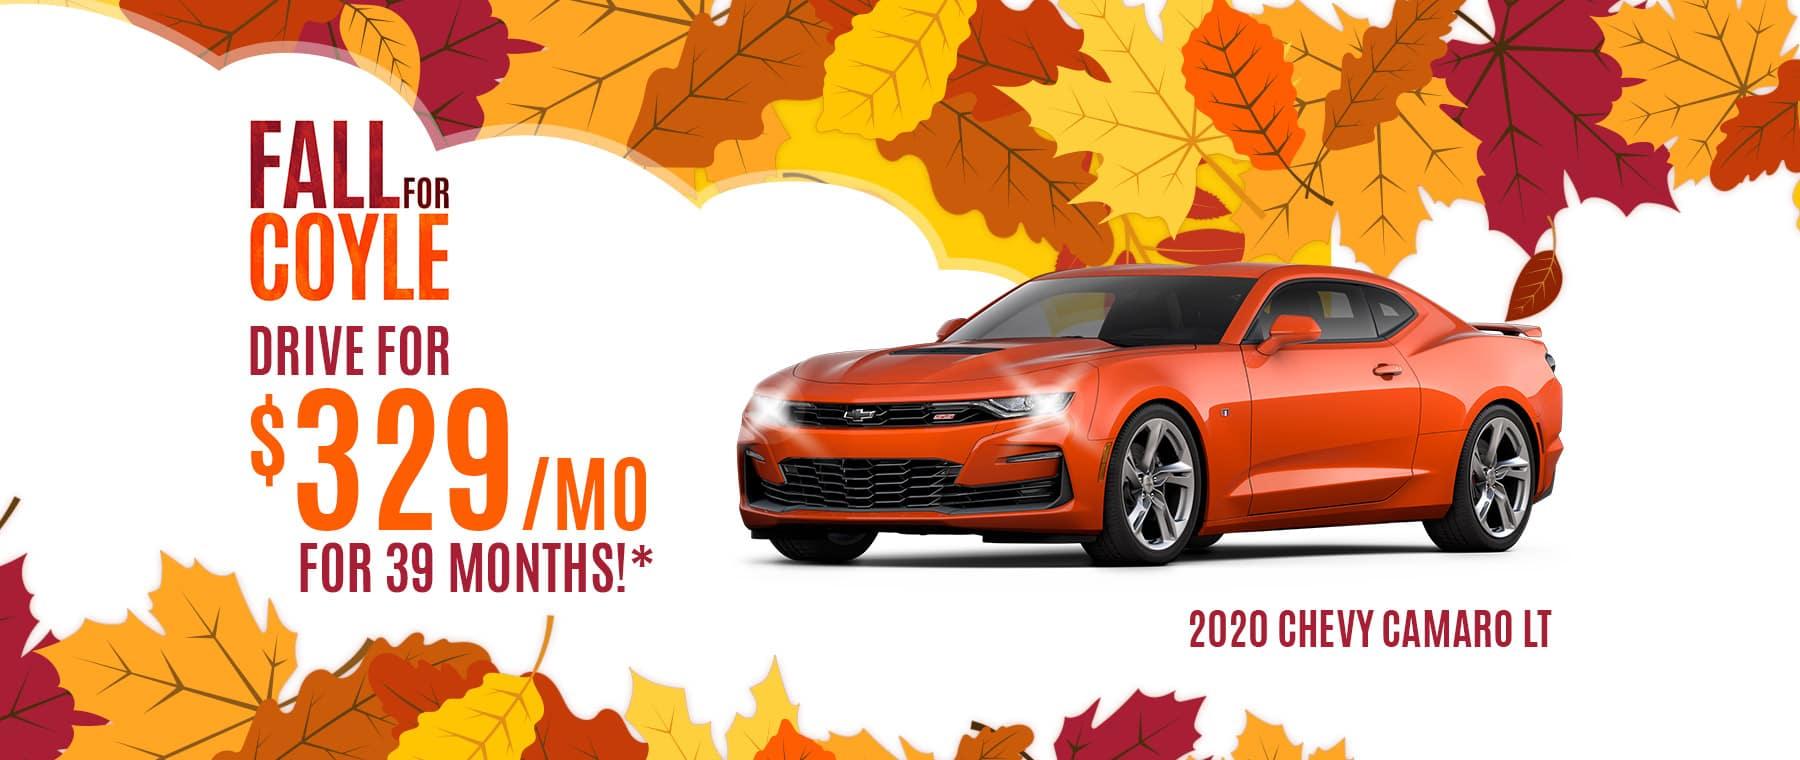 Best deal on new Camaro near Louisville, Kentucky